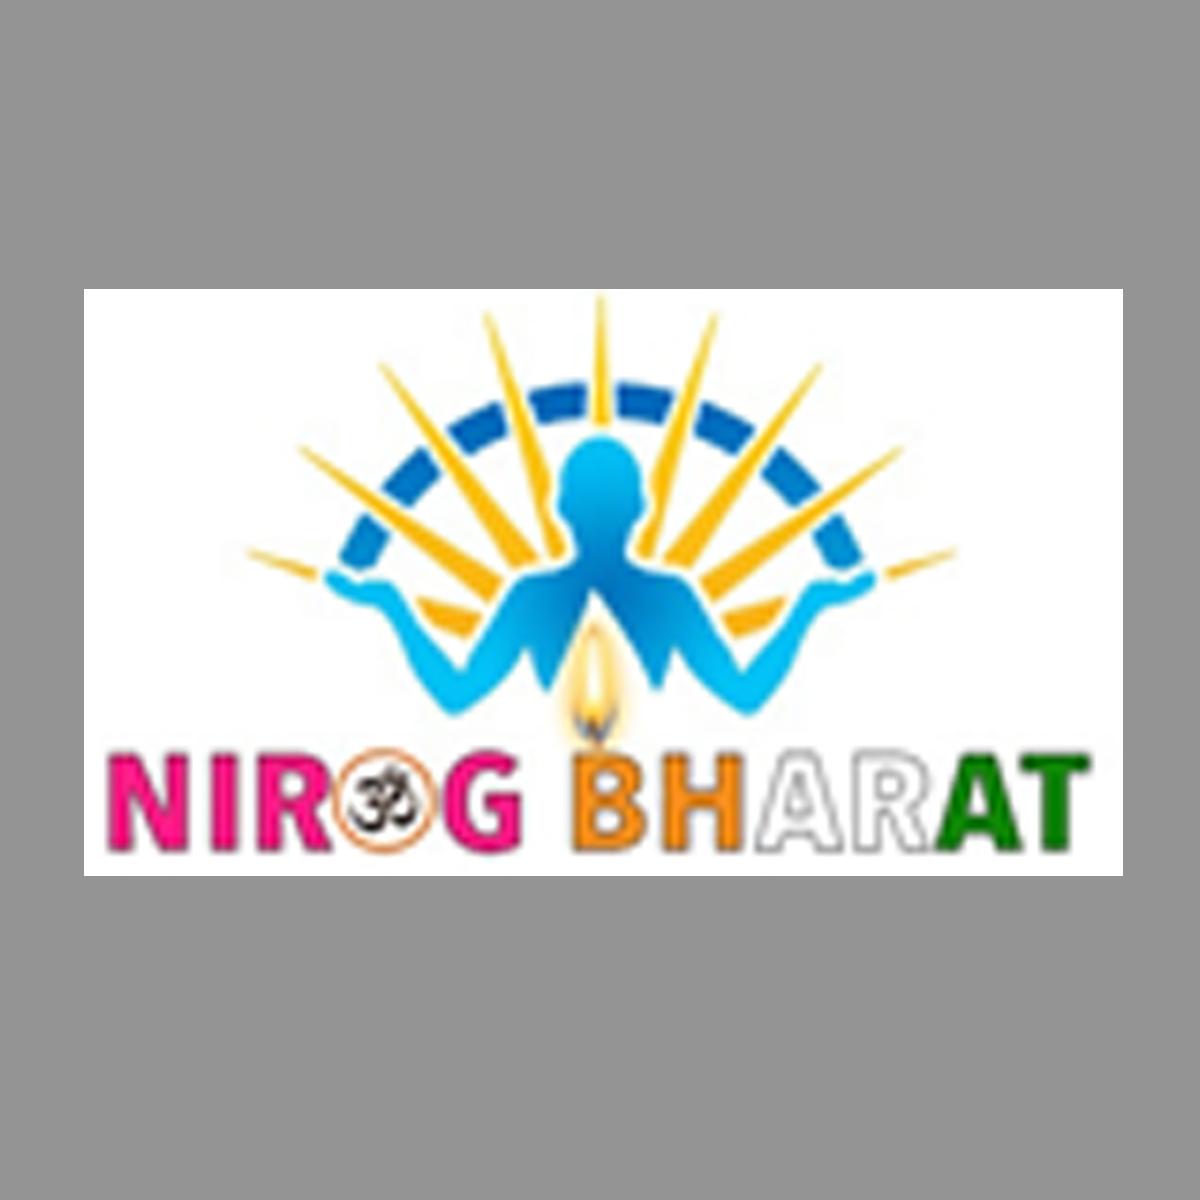 Nirog Bharat